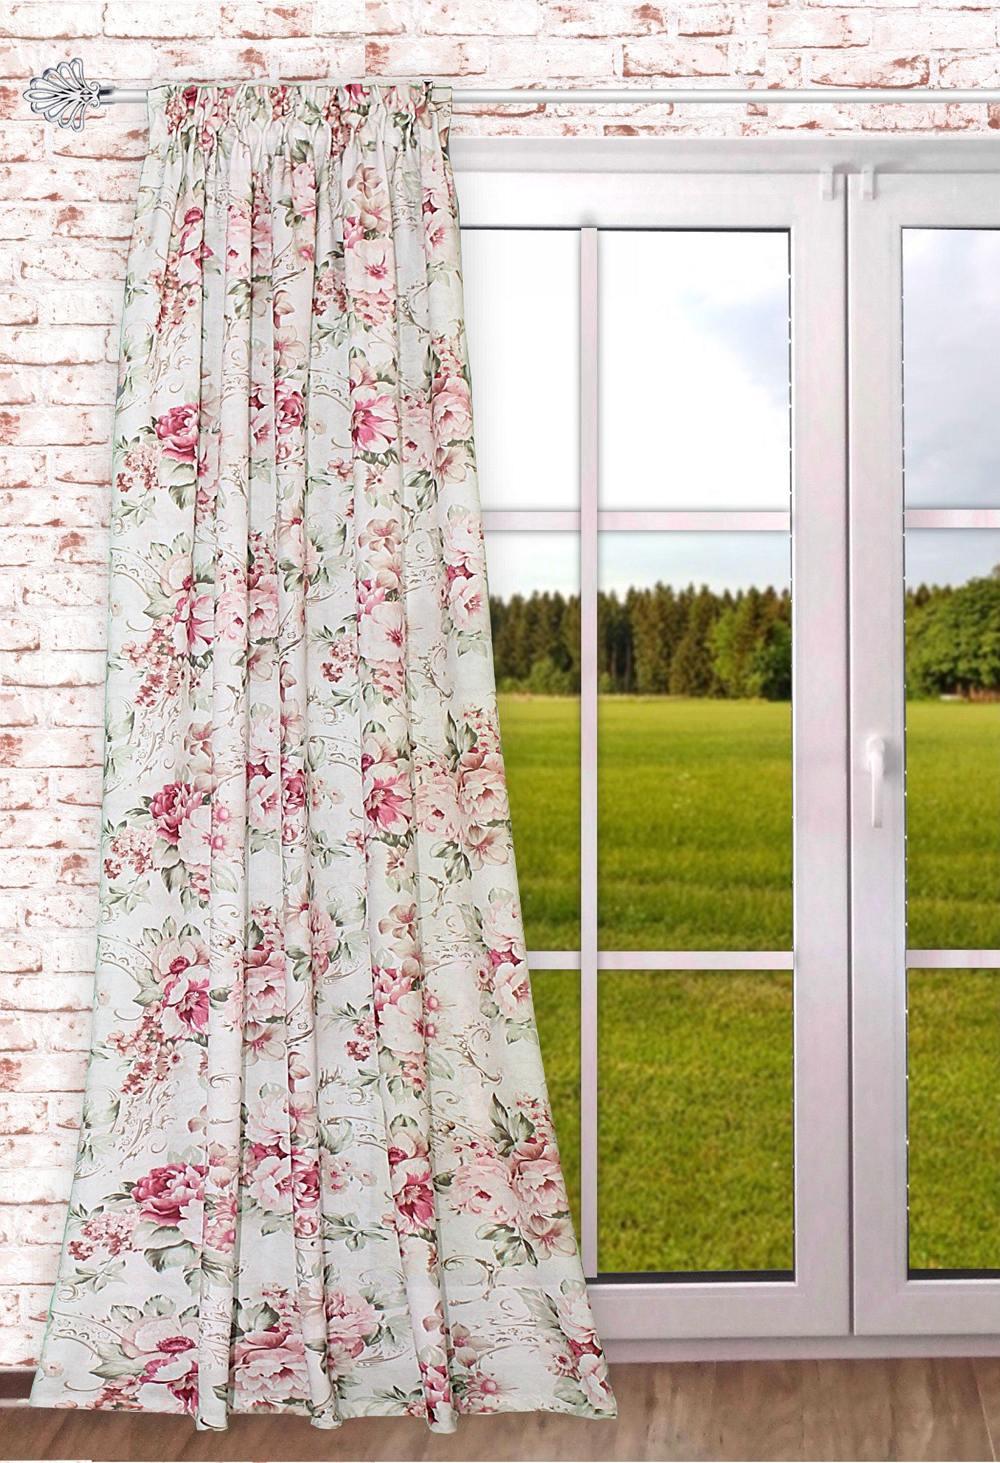 gardinen welt online shop gardine gardinenschal romantika. Black Bedroom Furniture Sets. Home Design Ideas